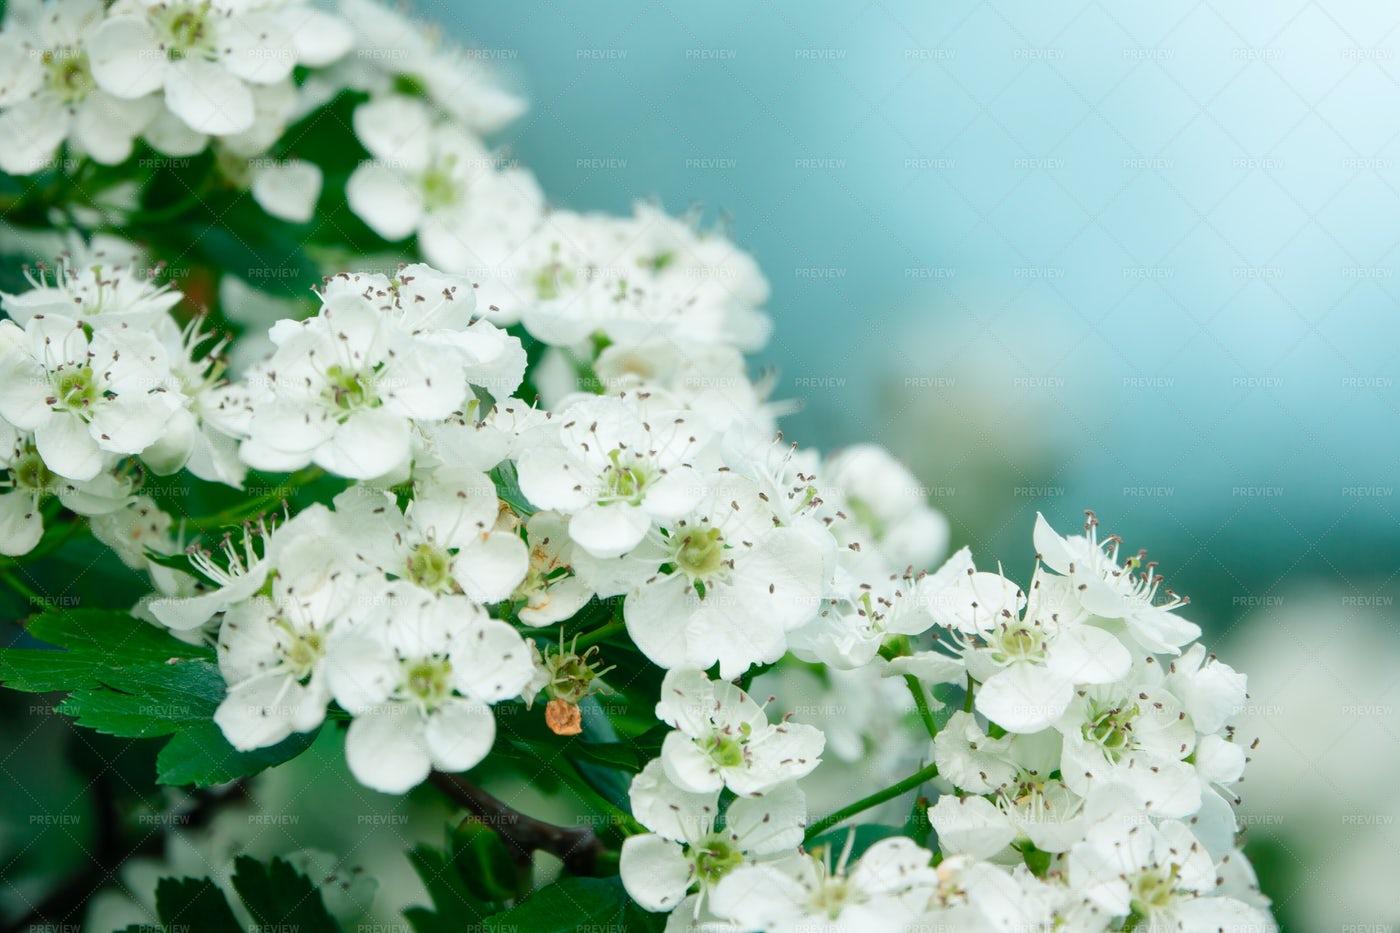 White Flowers On A Bush: Stock Photos